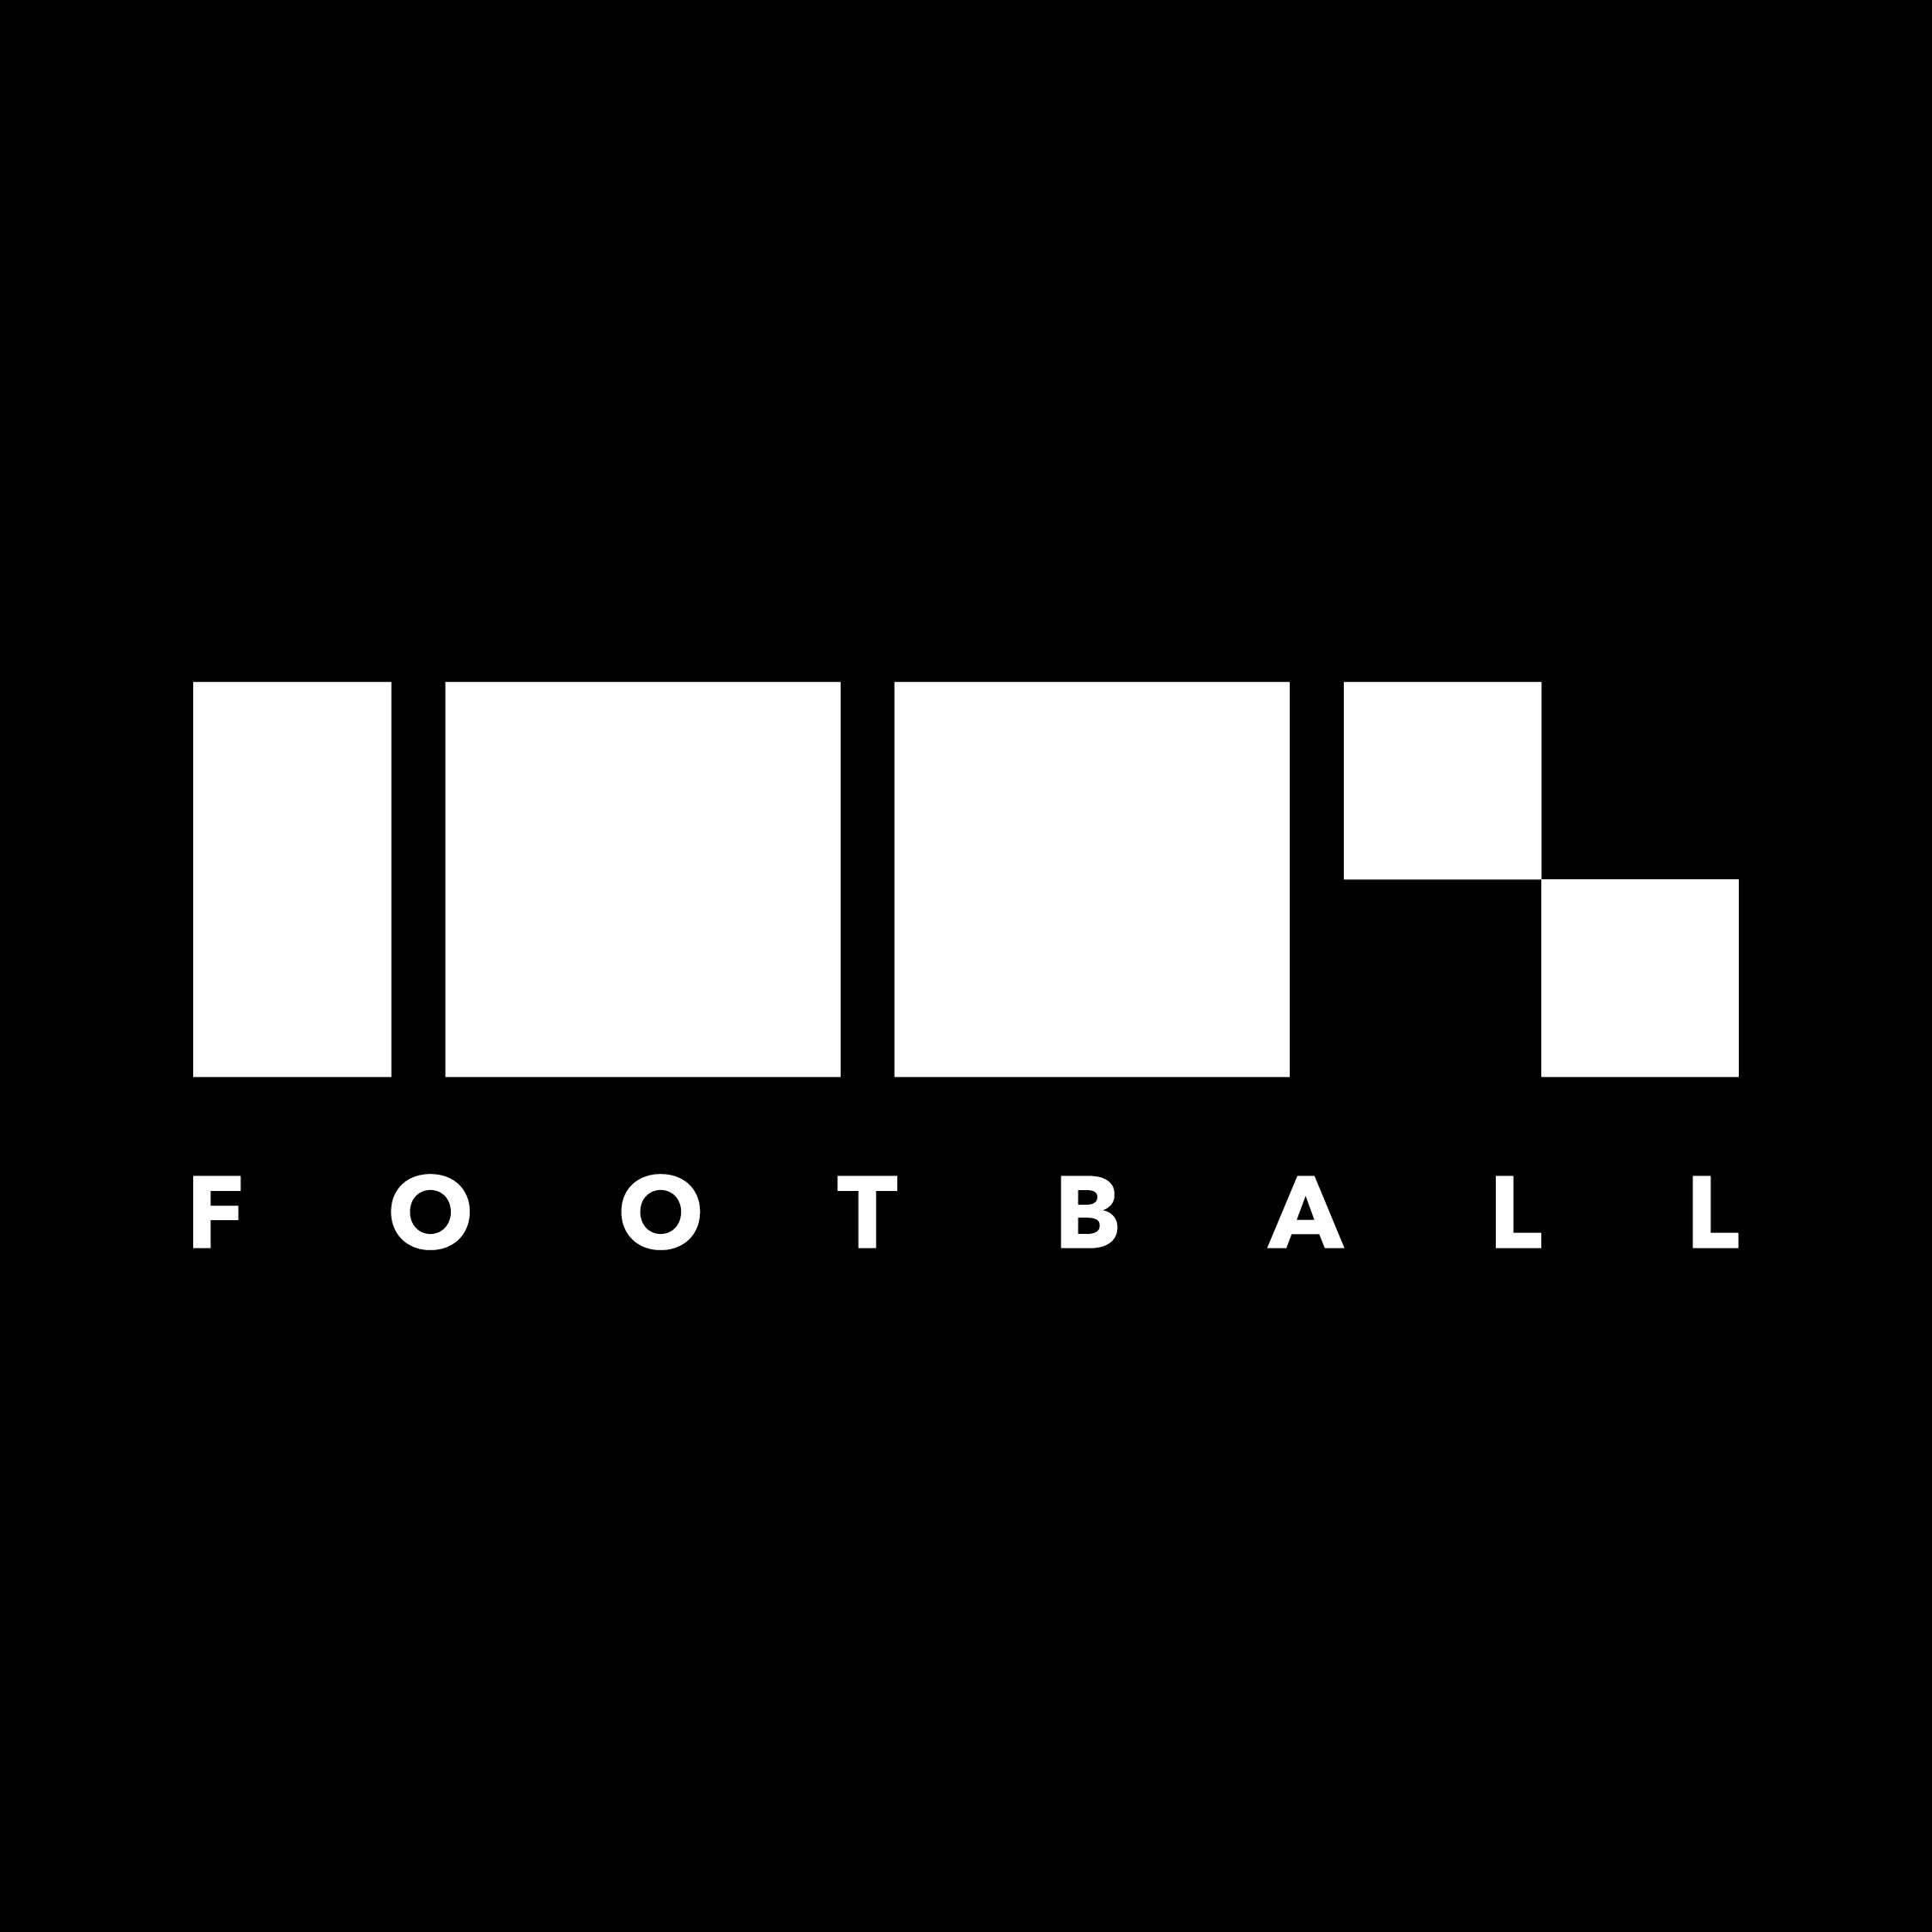 100% Football Zwolle